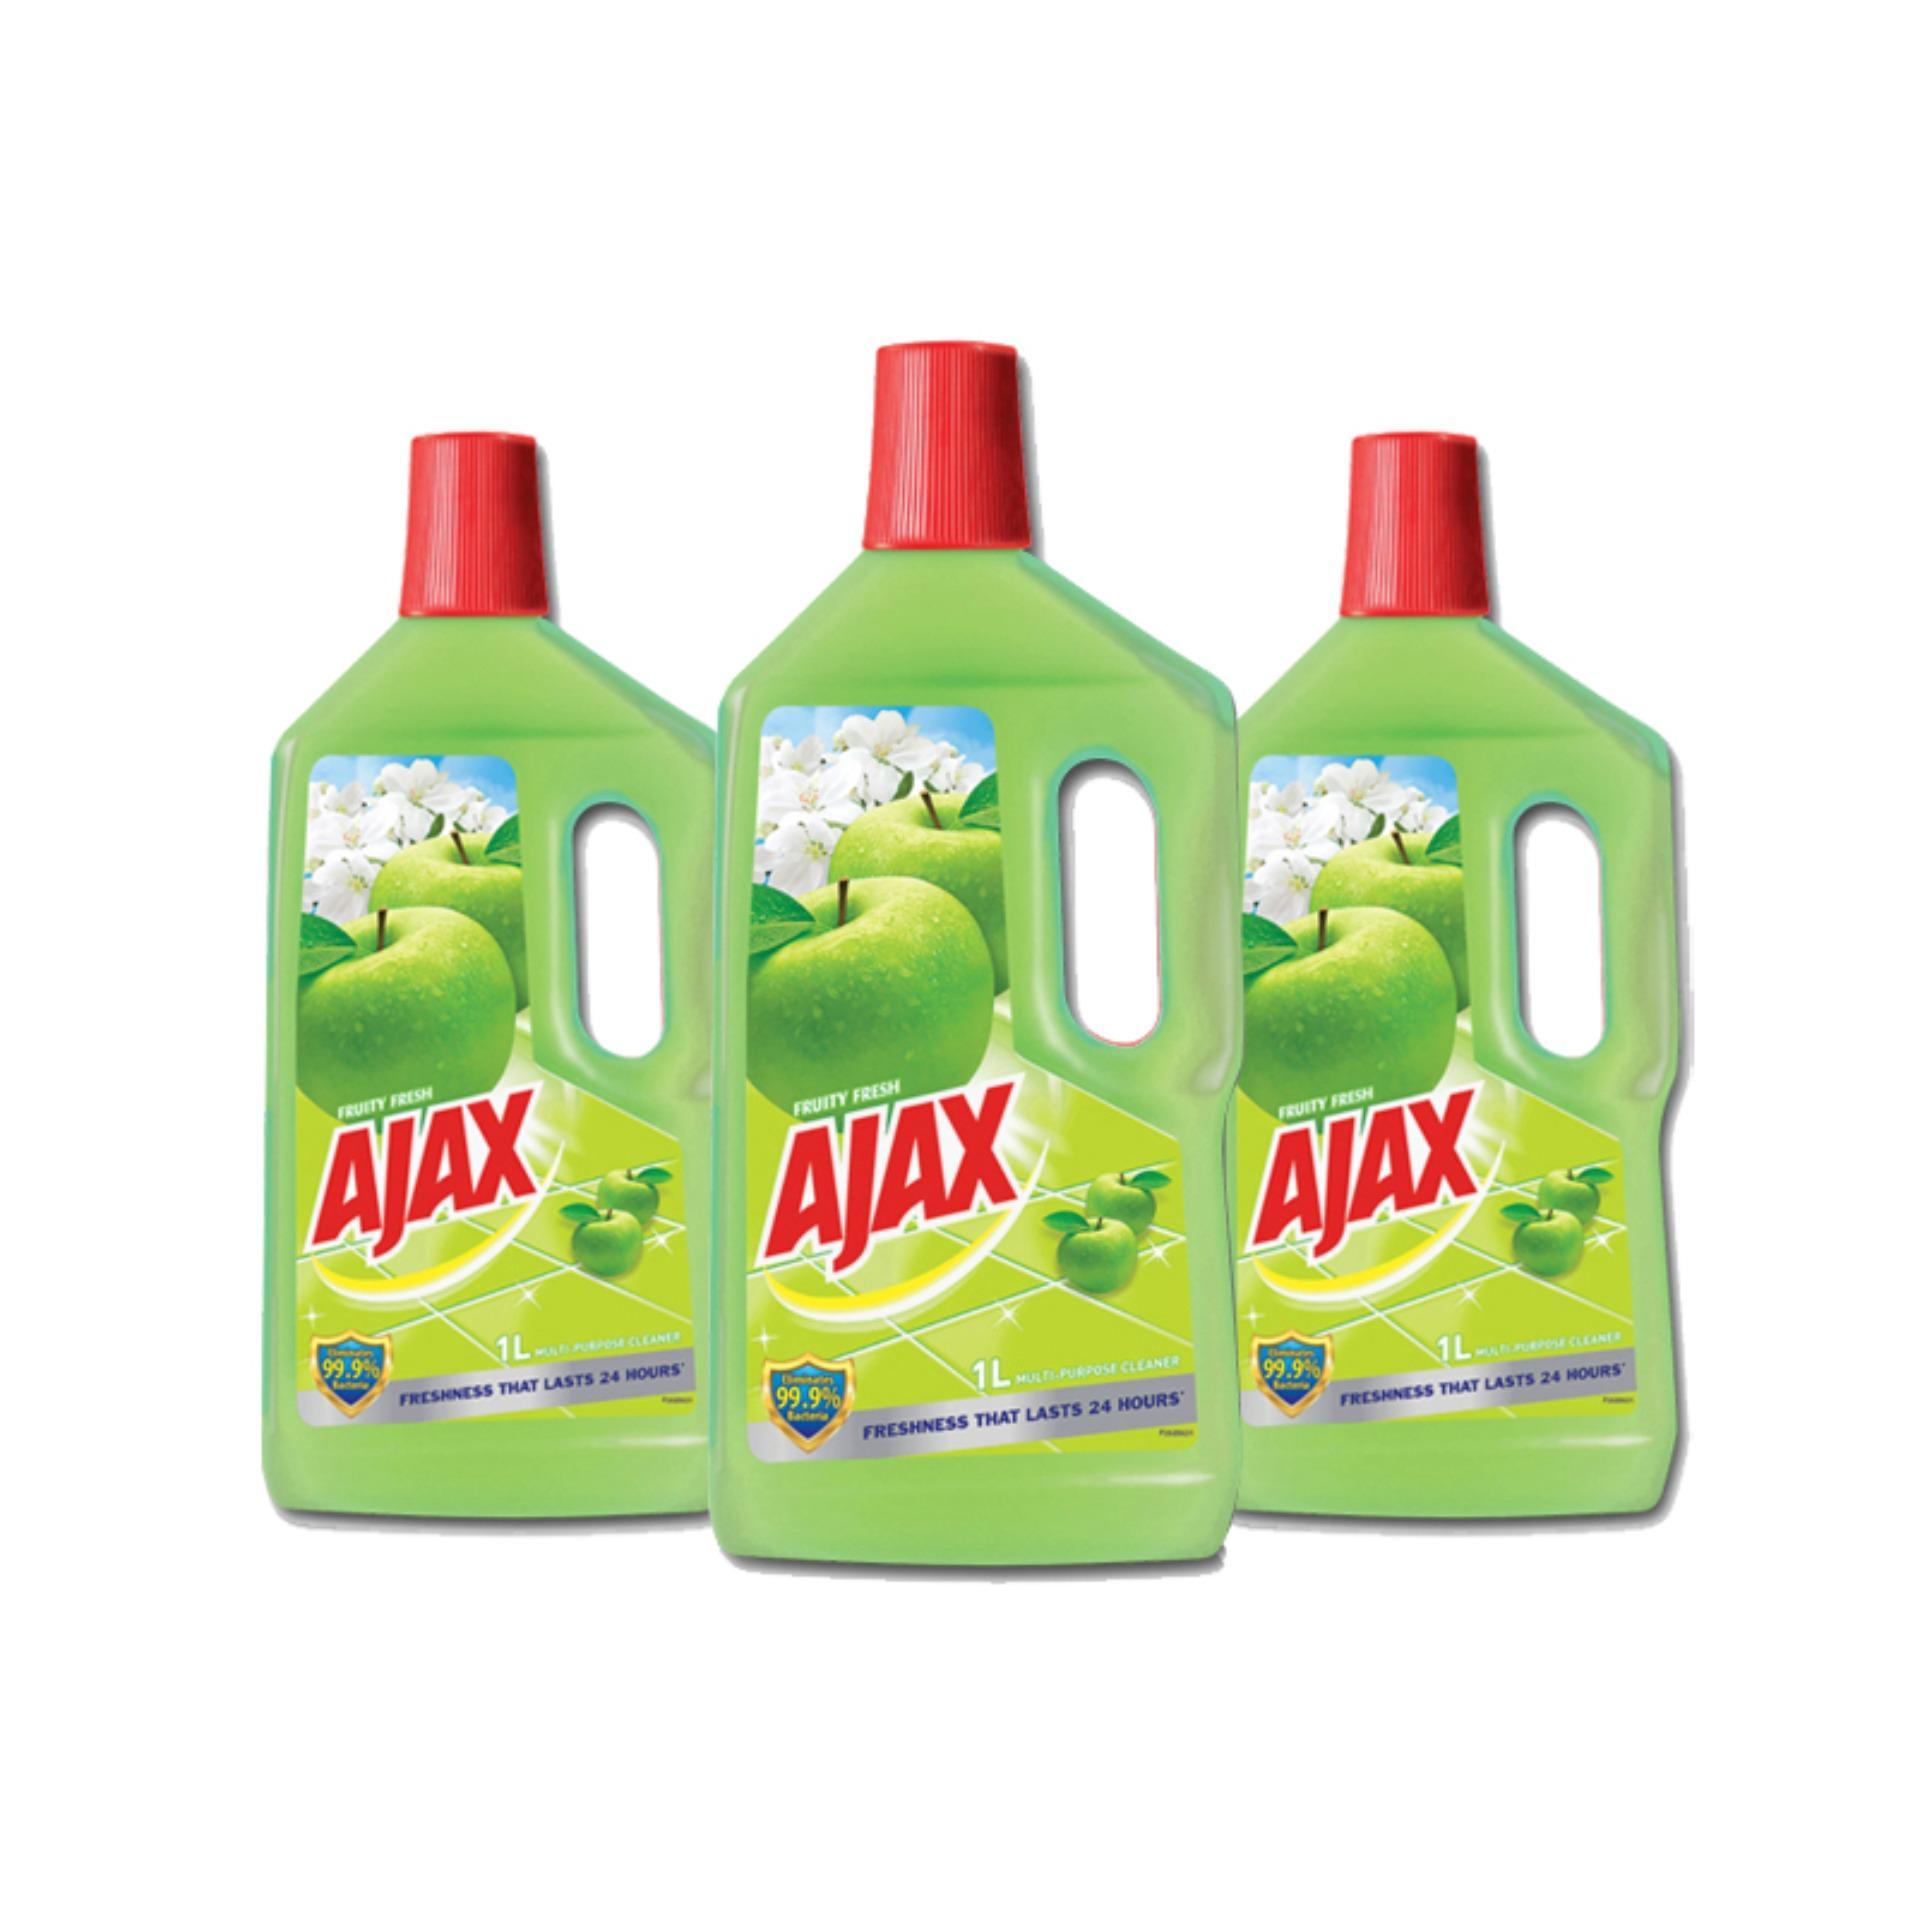 Ajax Fruity Fresh Multi-purpose Cleaner with Anti-bacterial Formula 1L,  Pack of 3